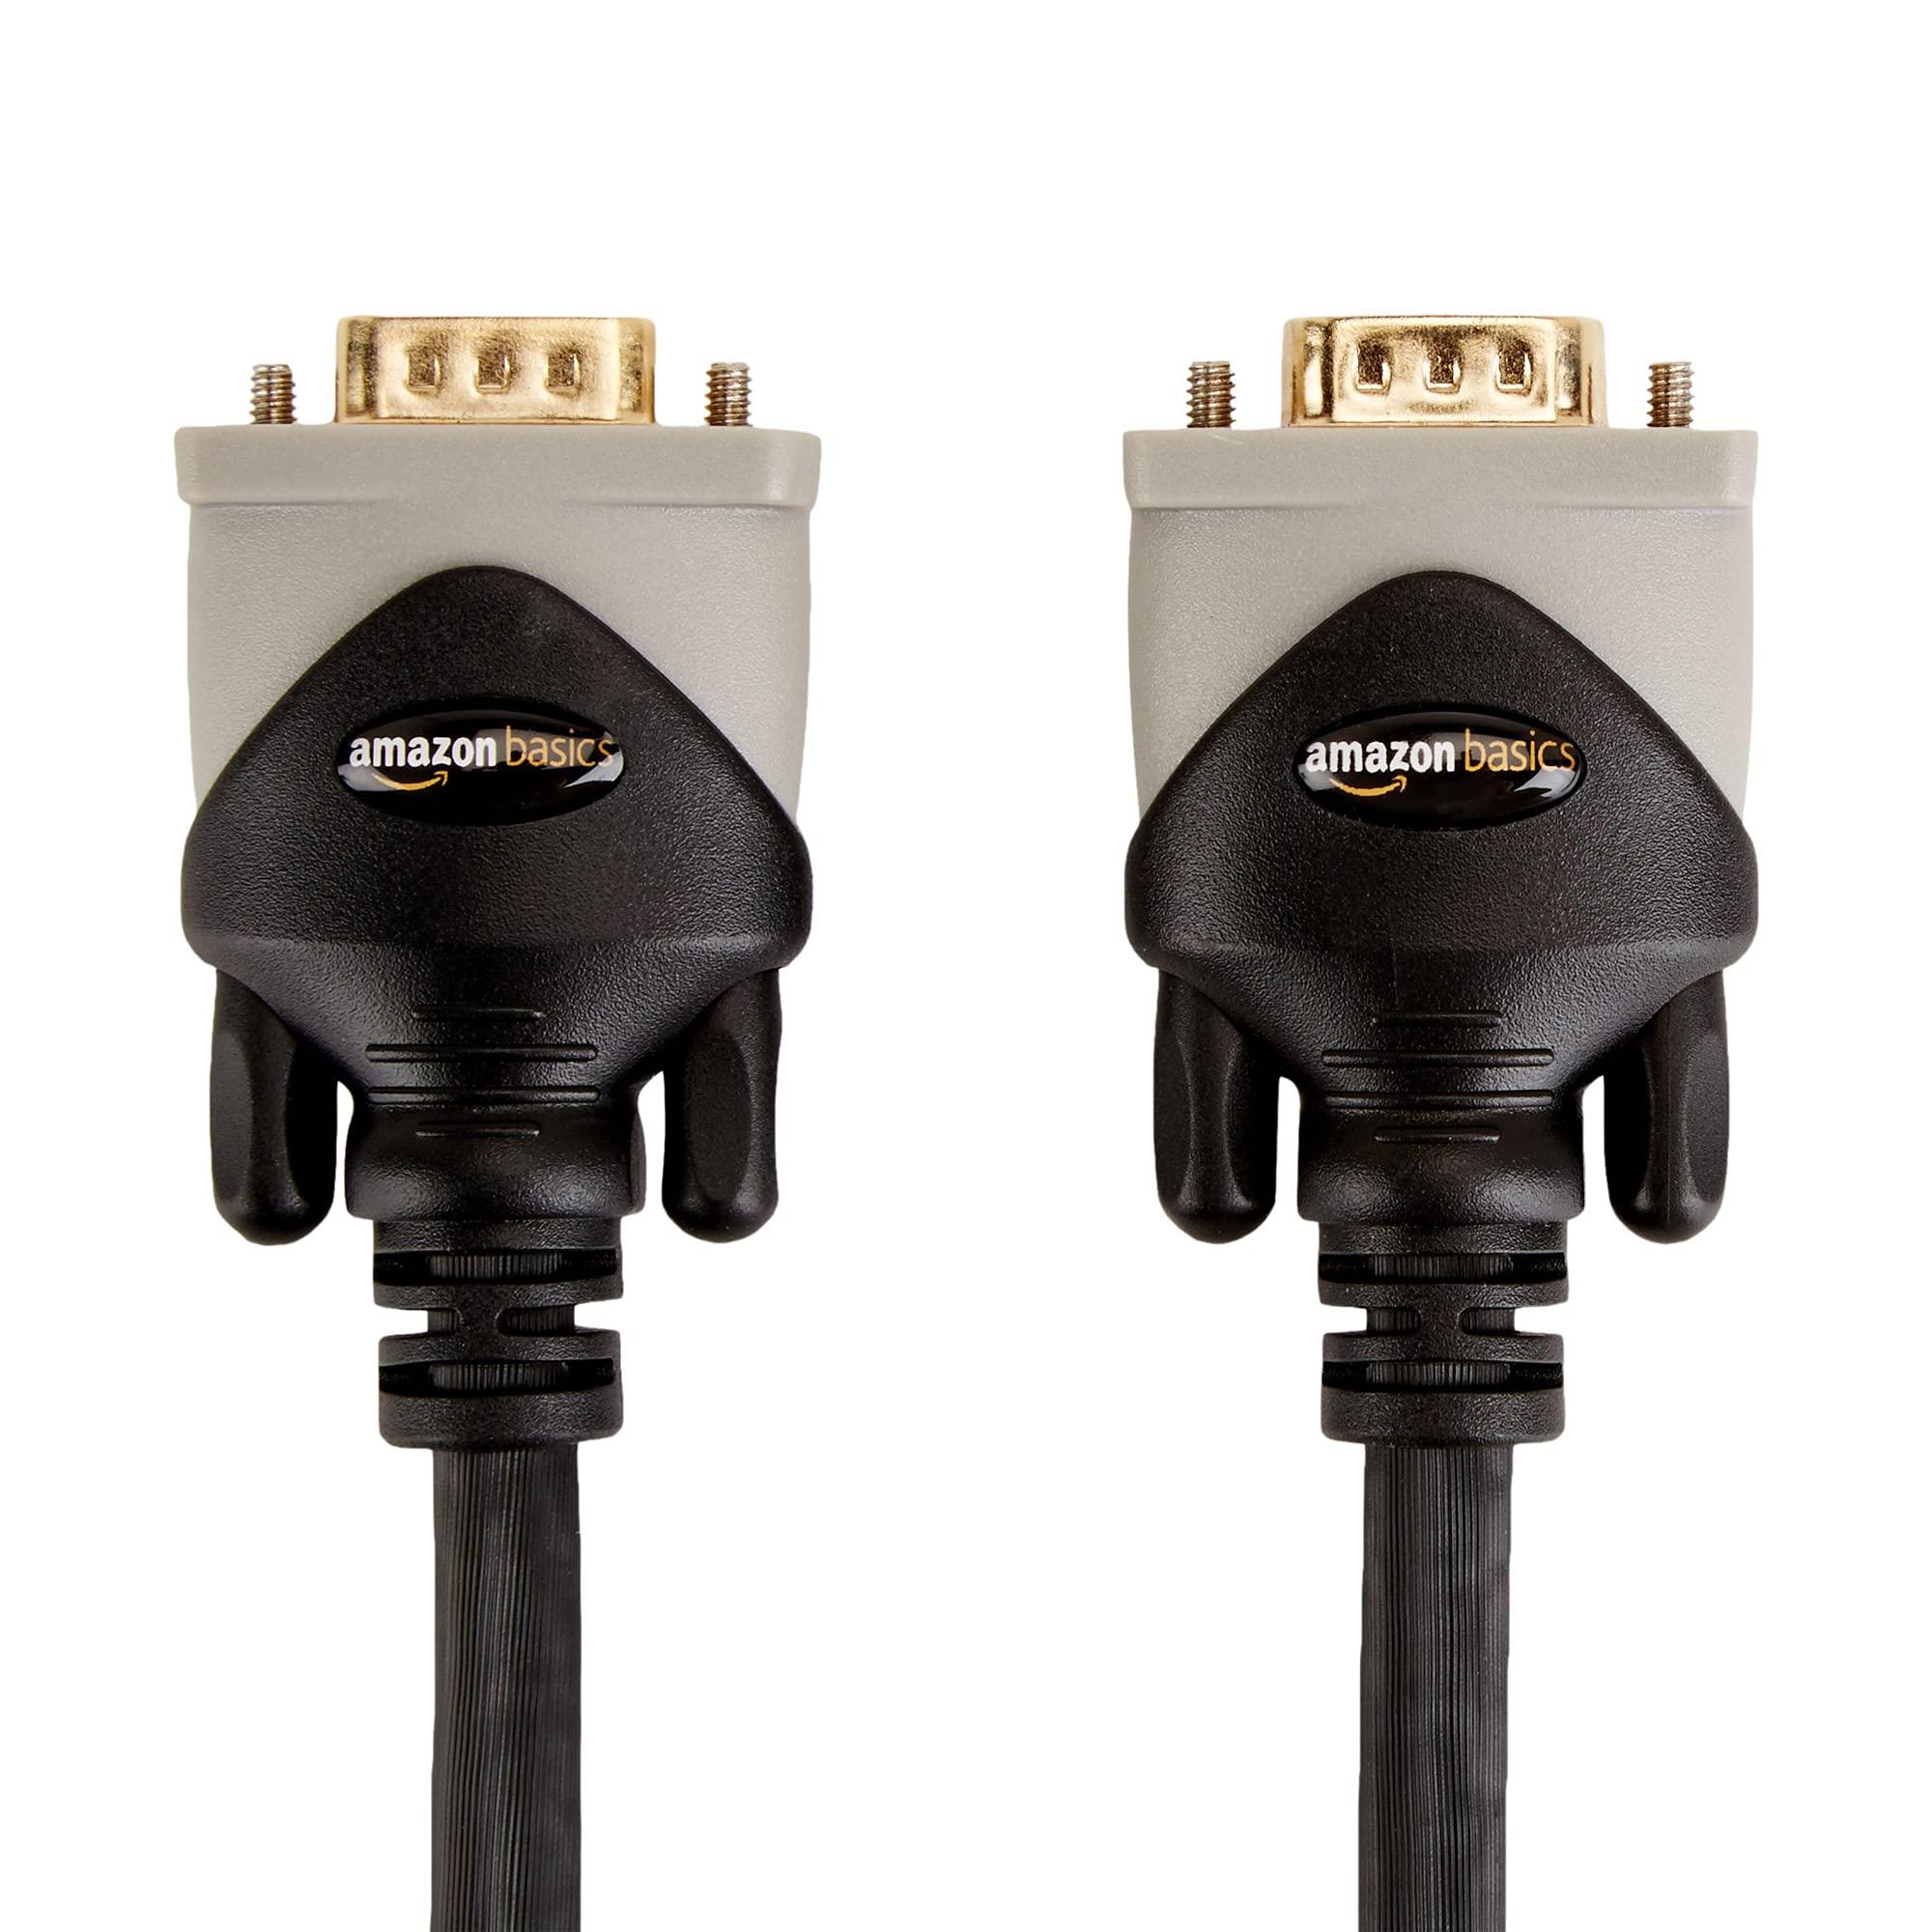 Amazon Basics VGA to VGA PC Computer Monitor Cable - 6 Feet (1.8 Meters)